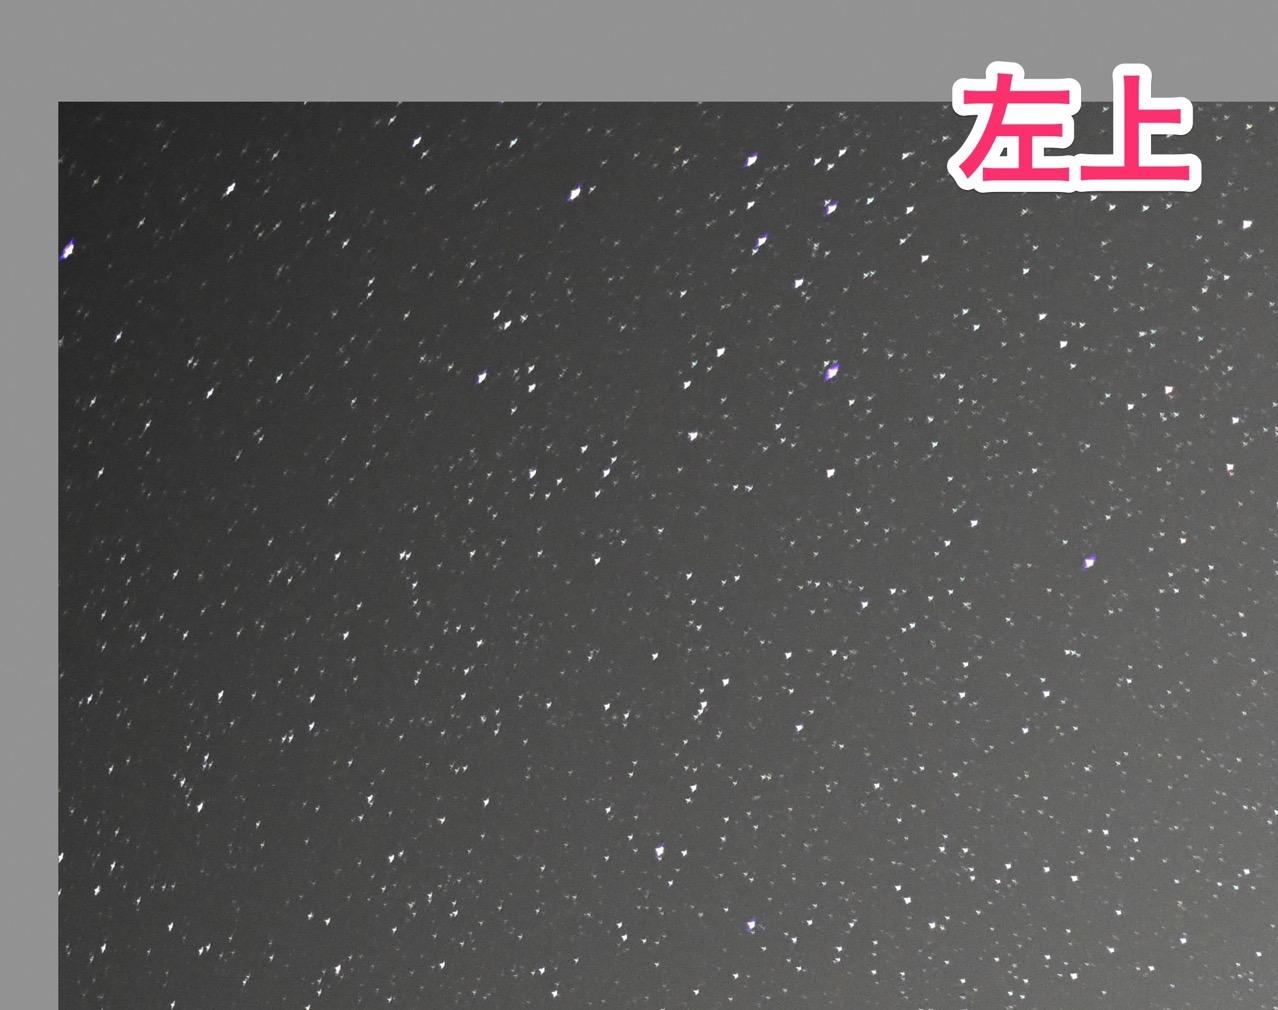 NIKKOR Z 58mm f/0.95 S Noctで星